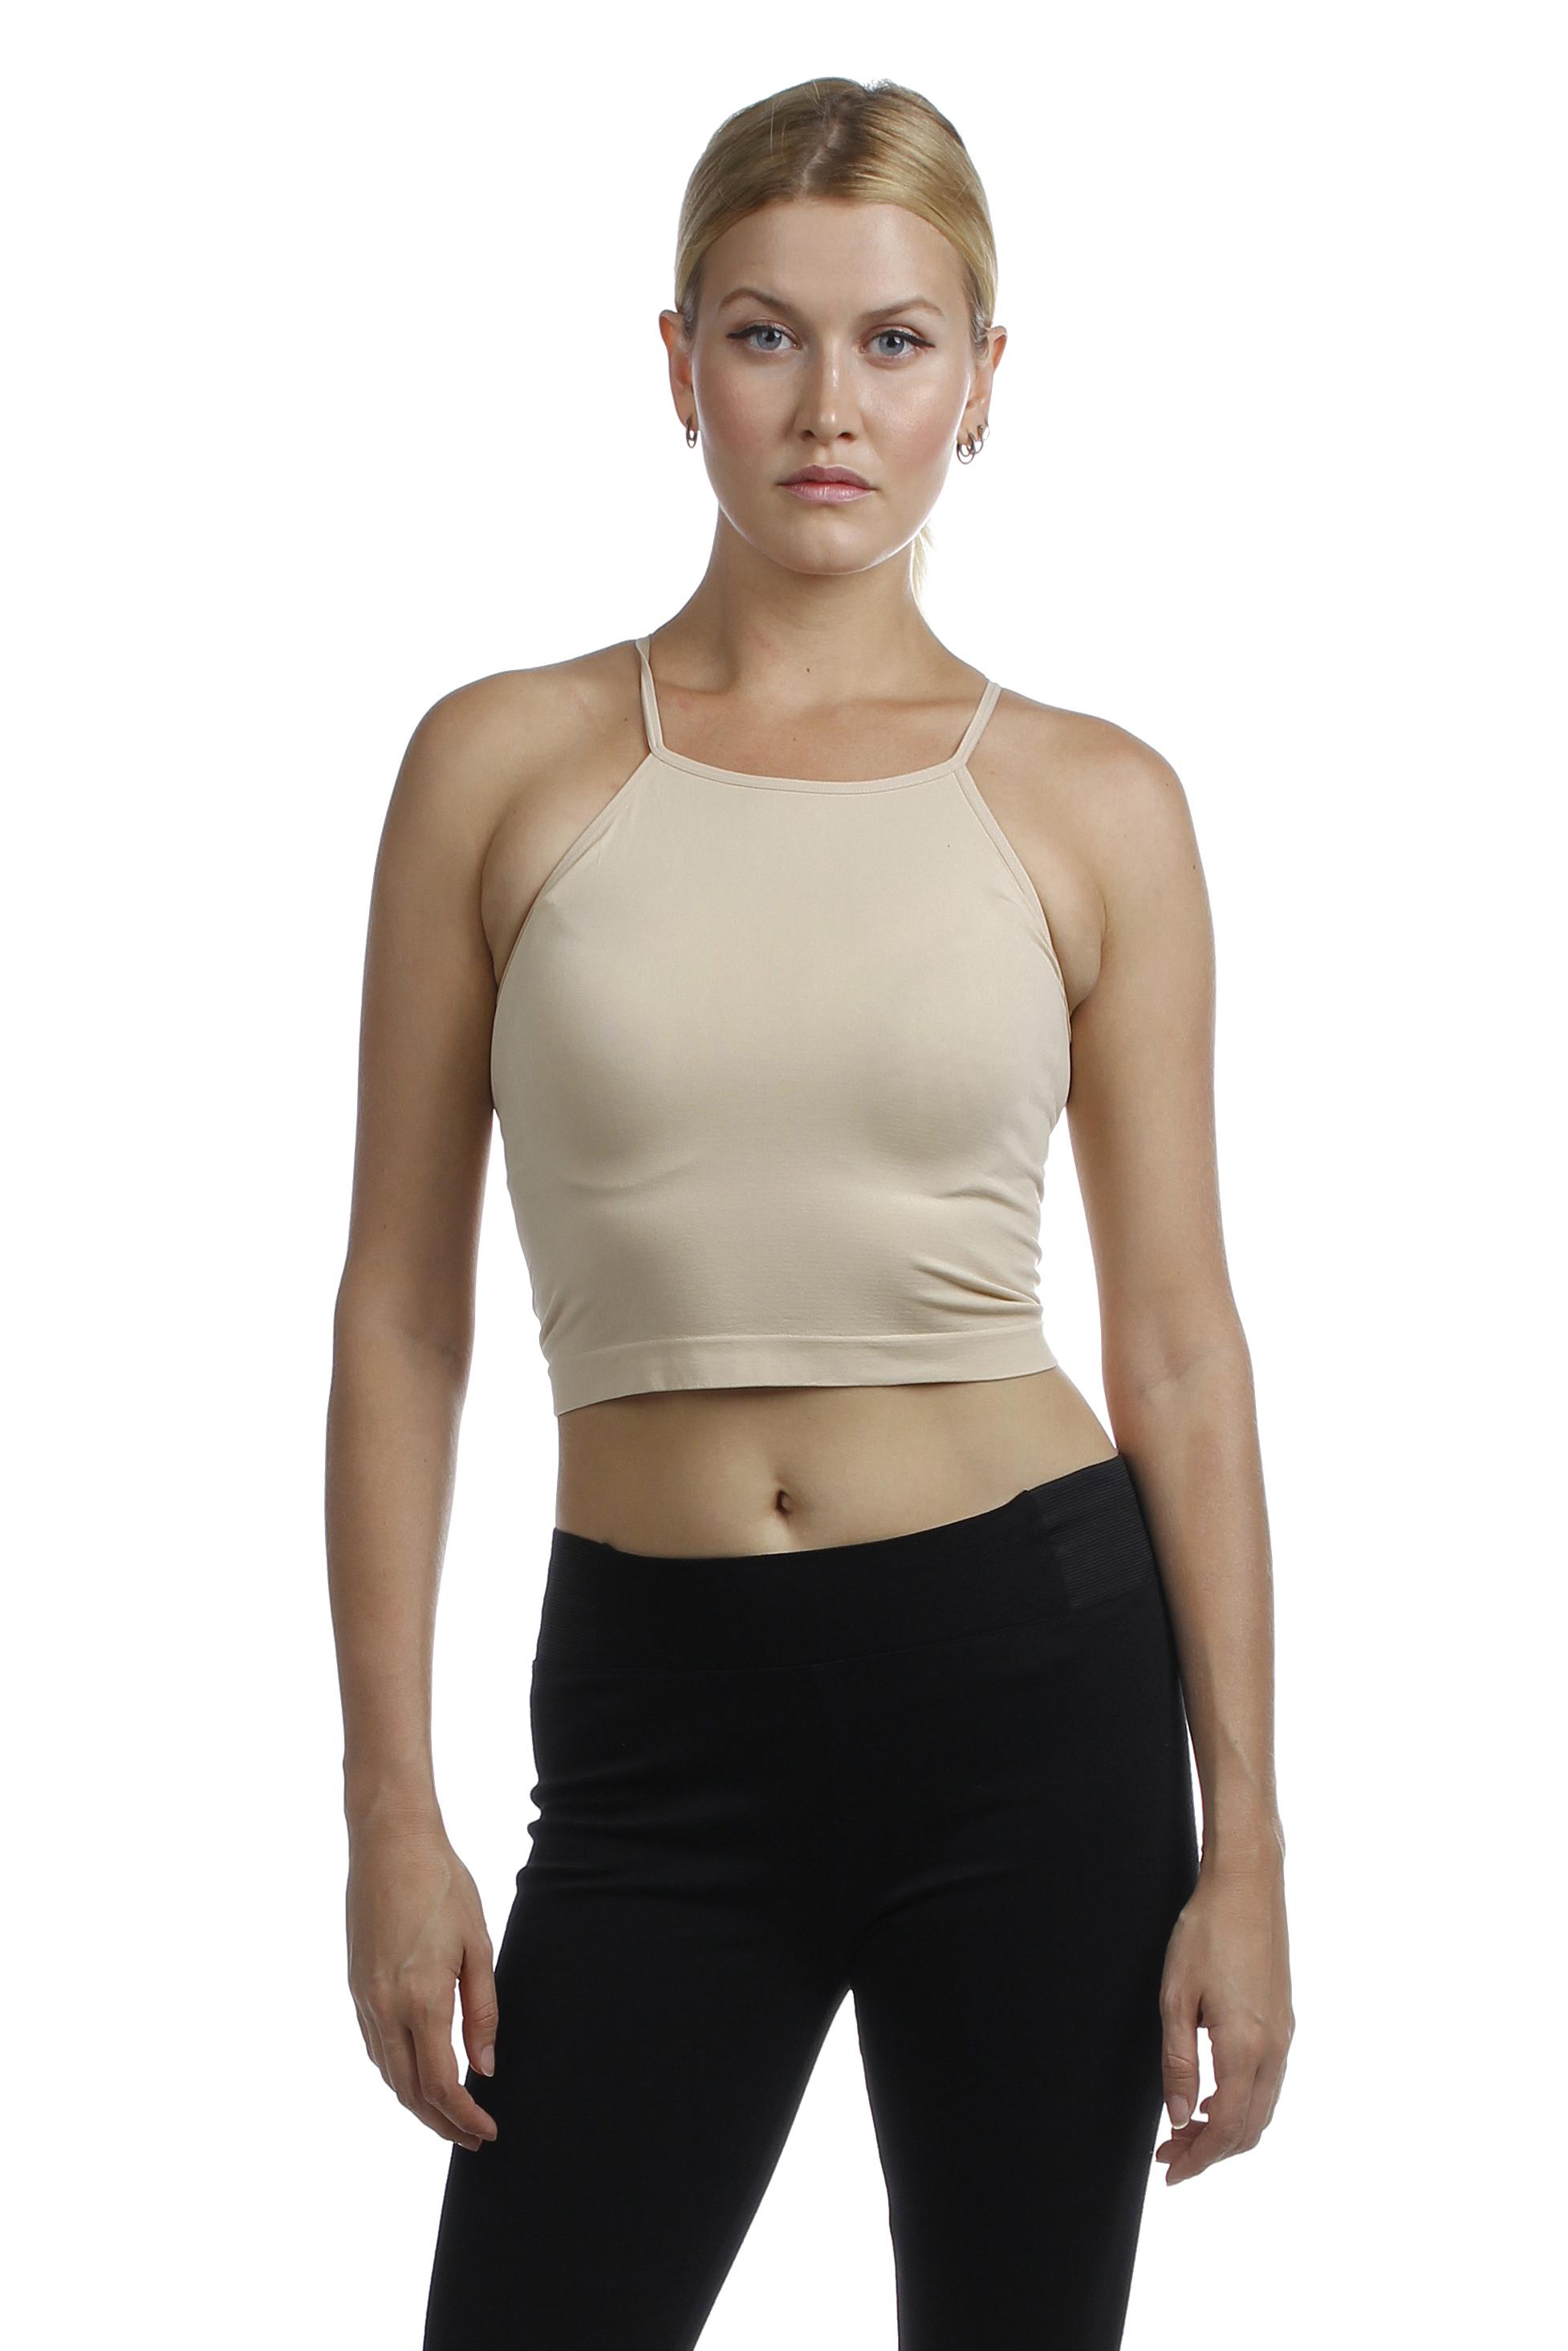 Emmalise Junior Women's Sexy Athletic Seamless Basic Stretchy Crop Short Top Shirt